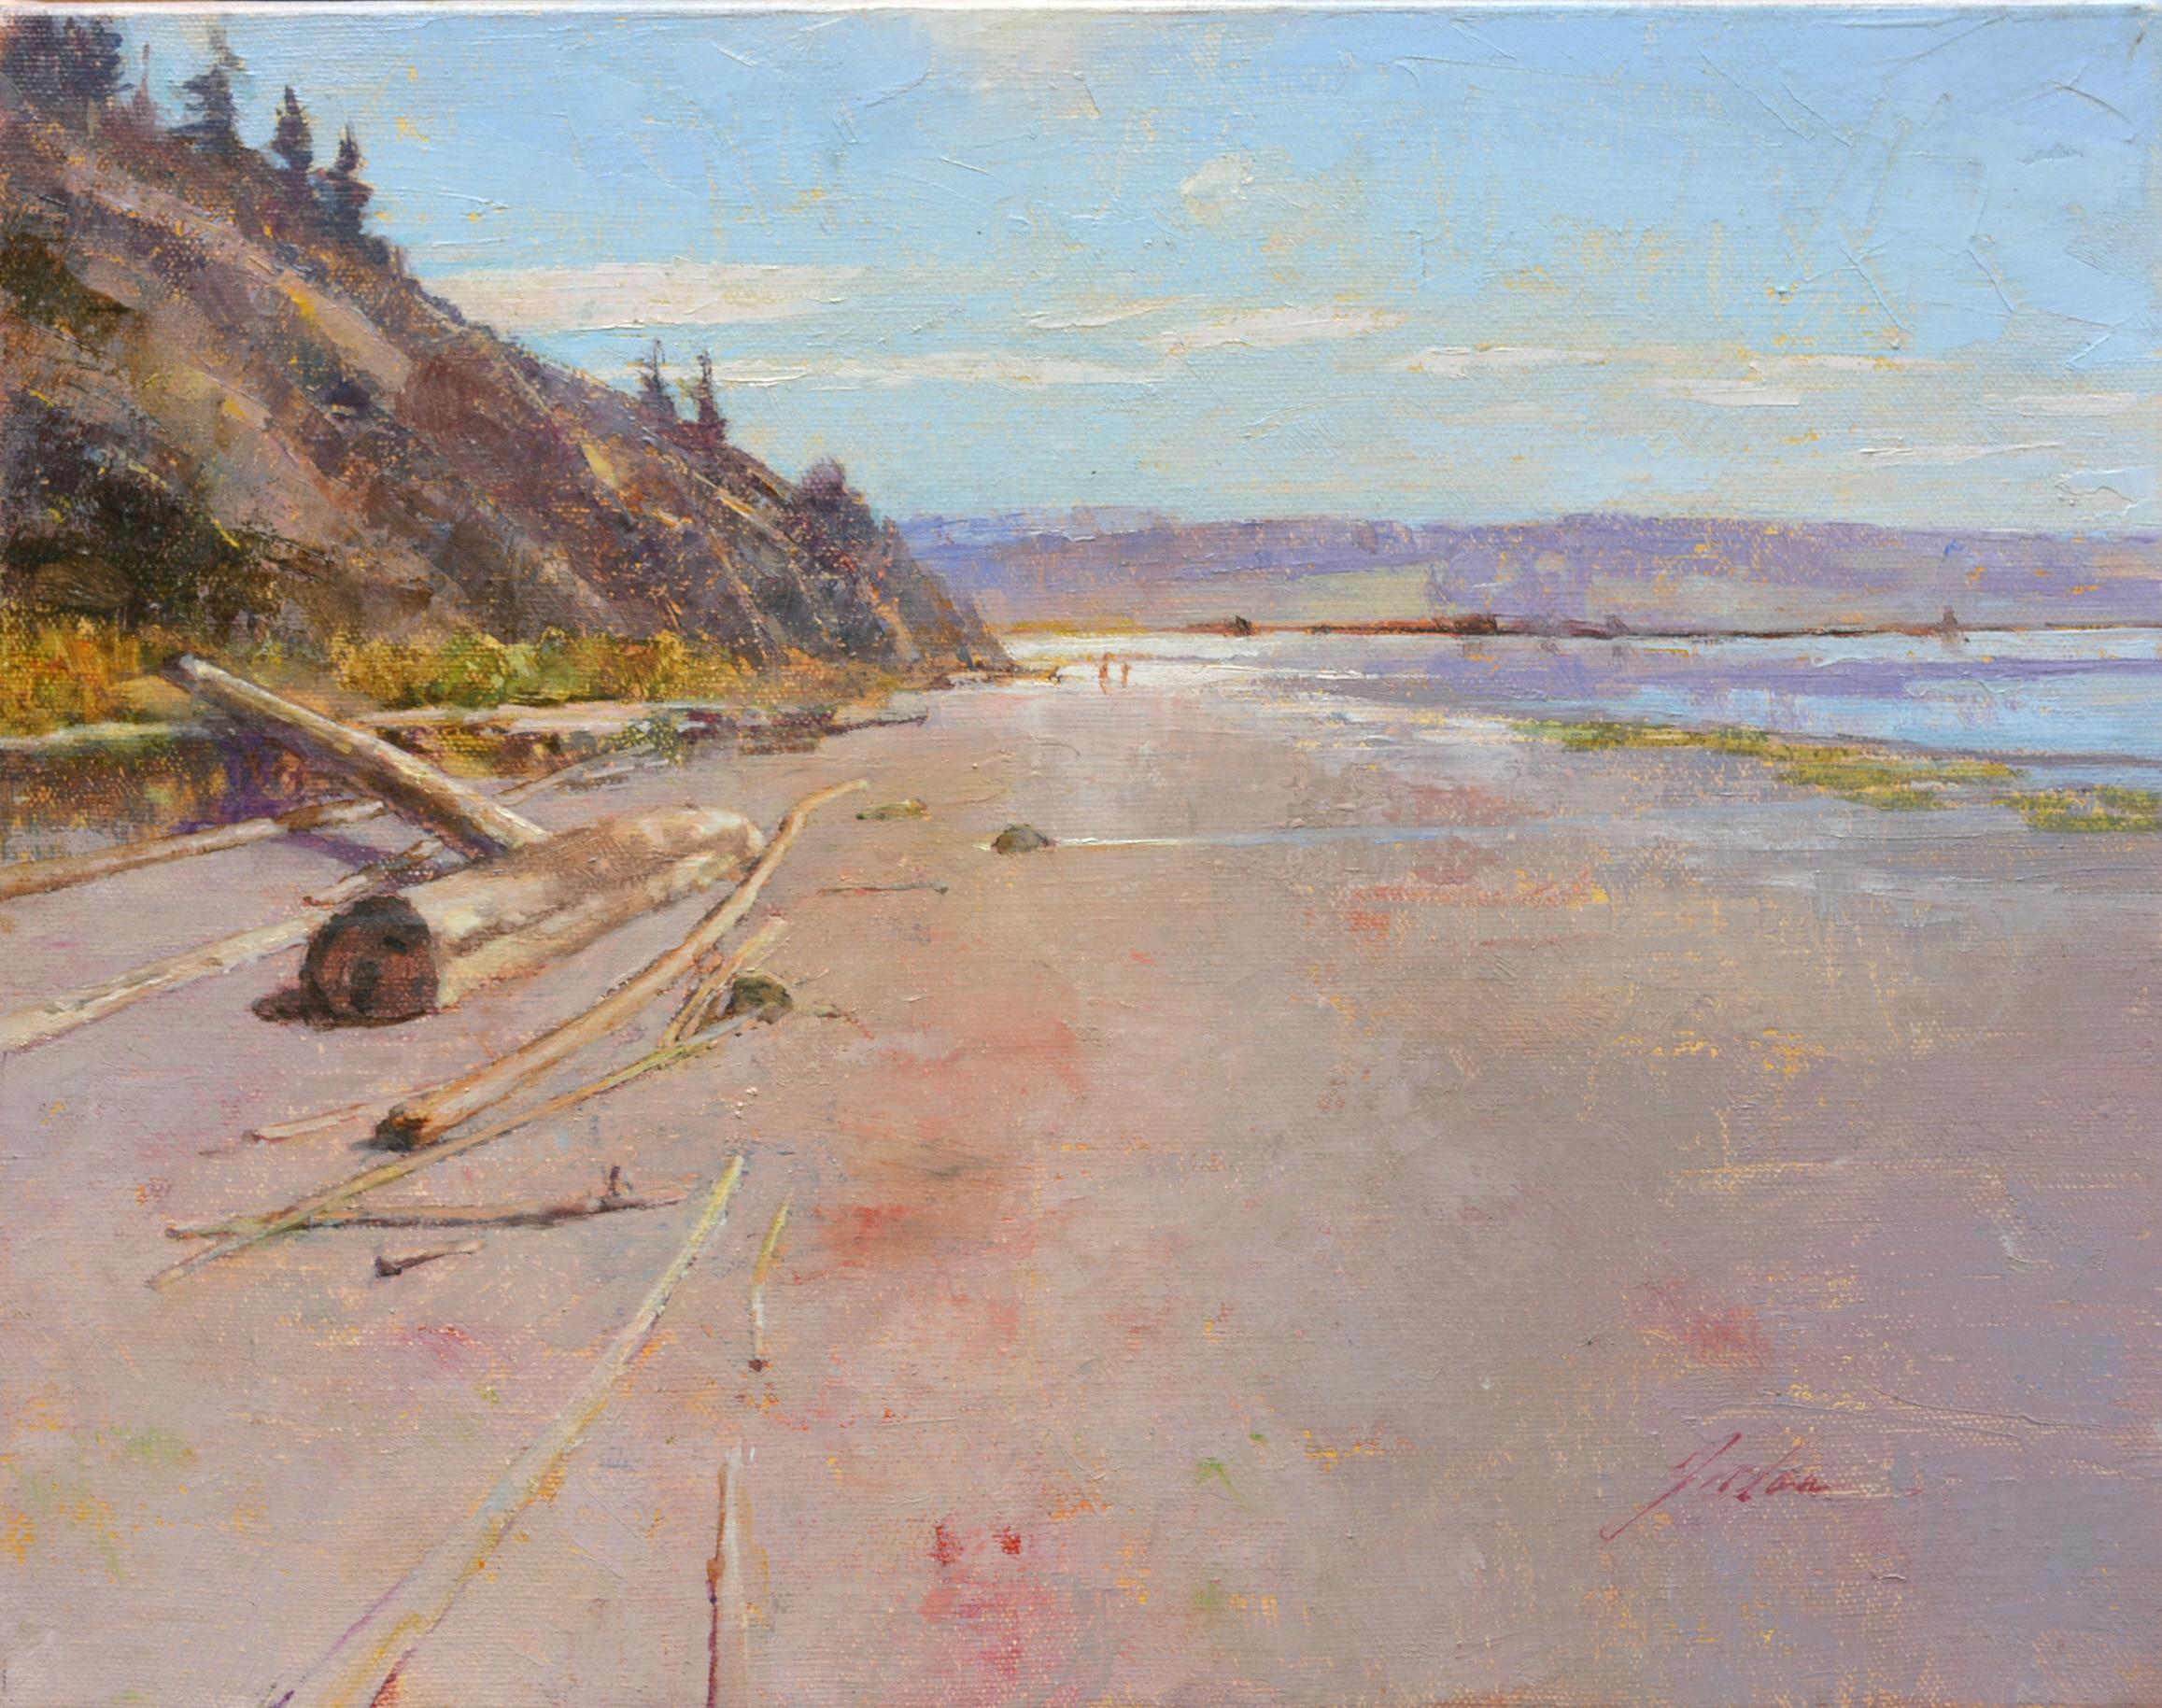 """Beach Walkers"" oil on canvas, 11 x 14"" $1,000"